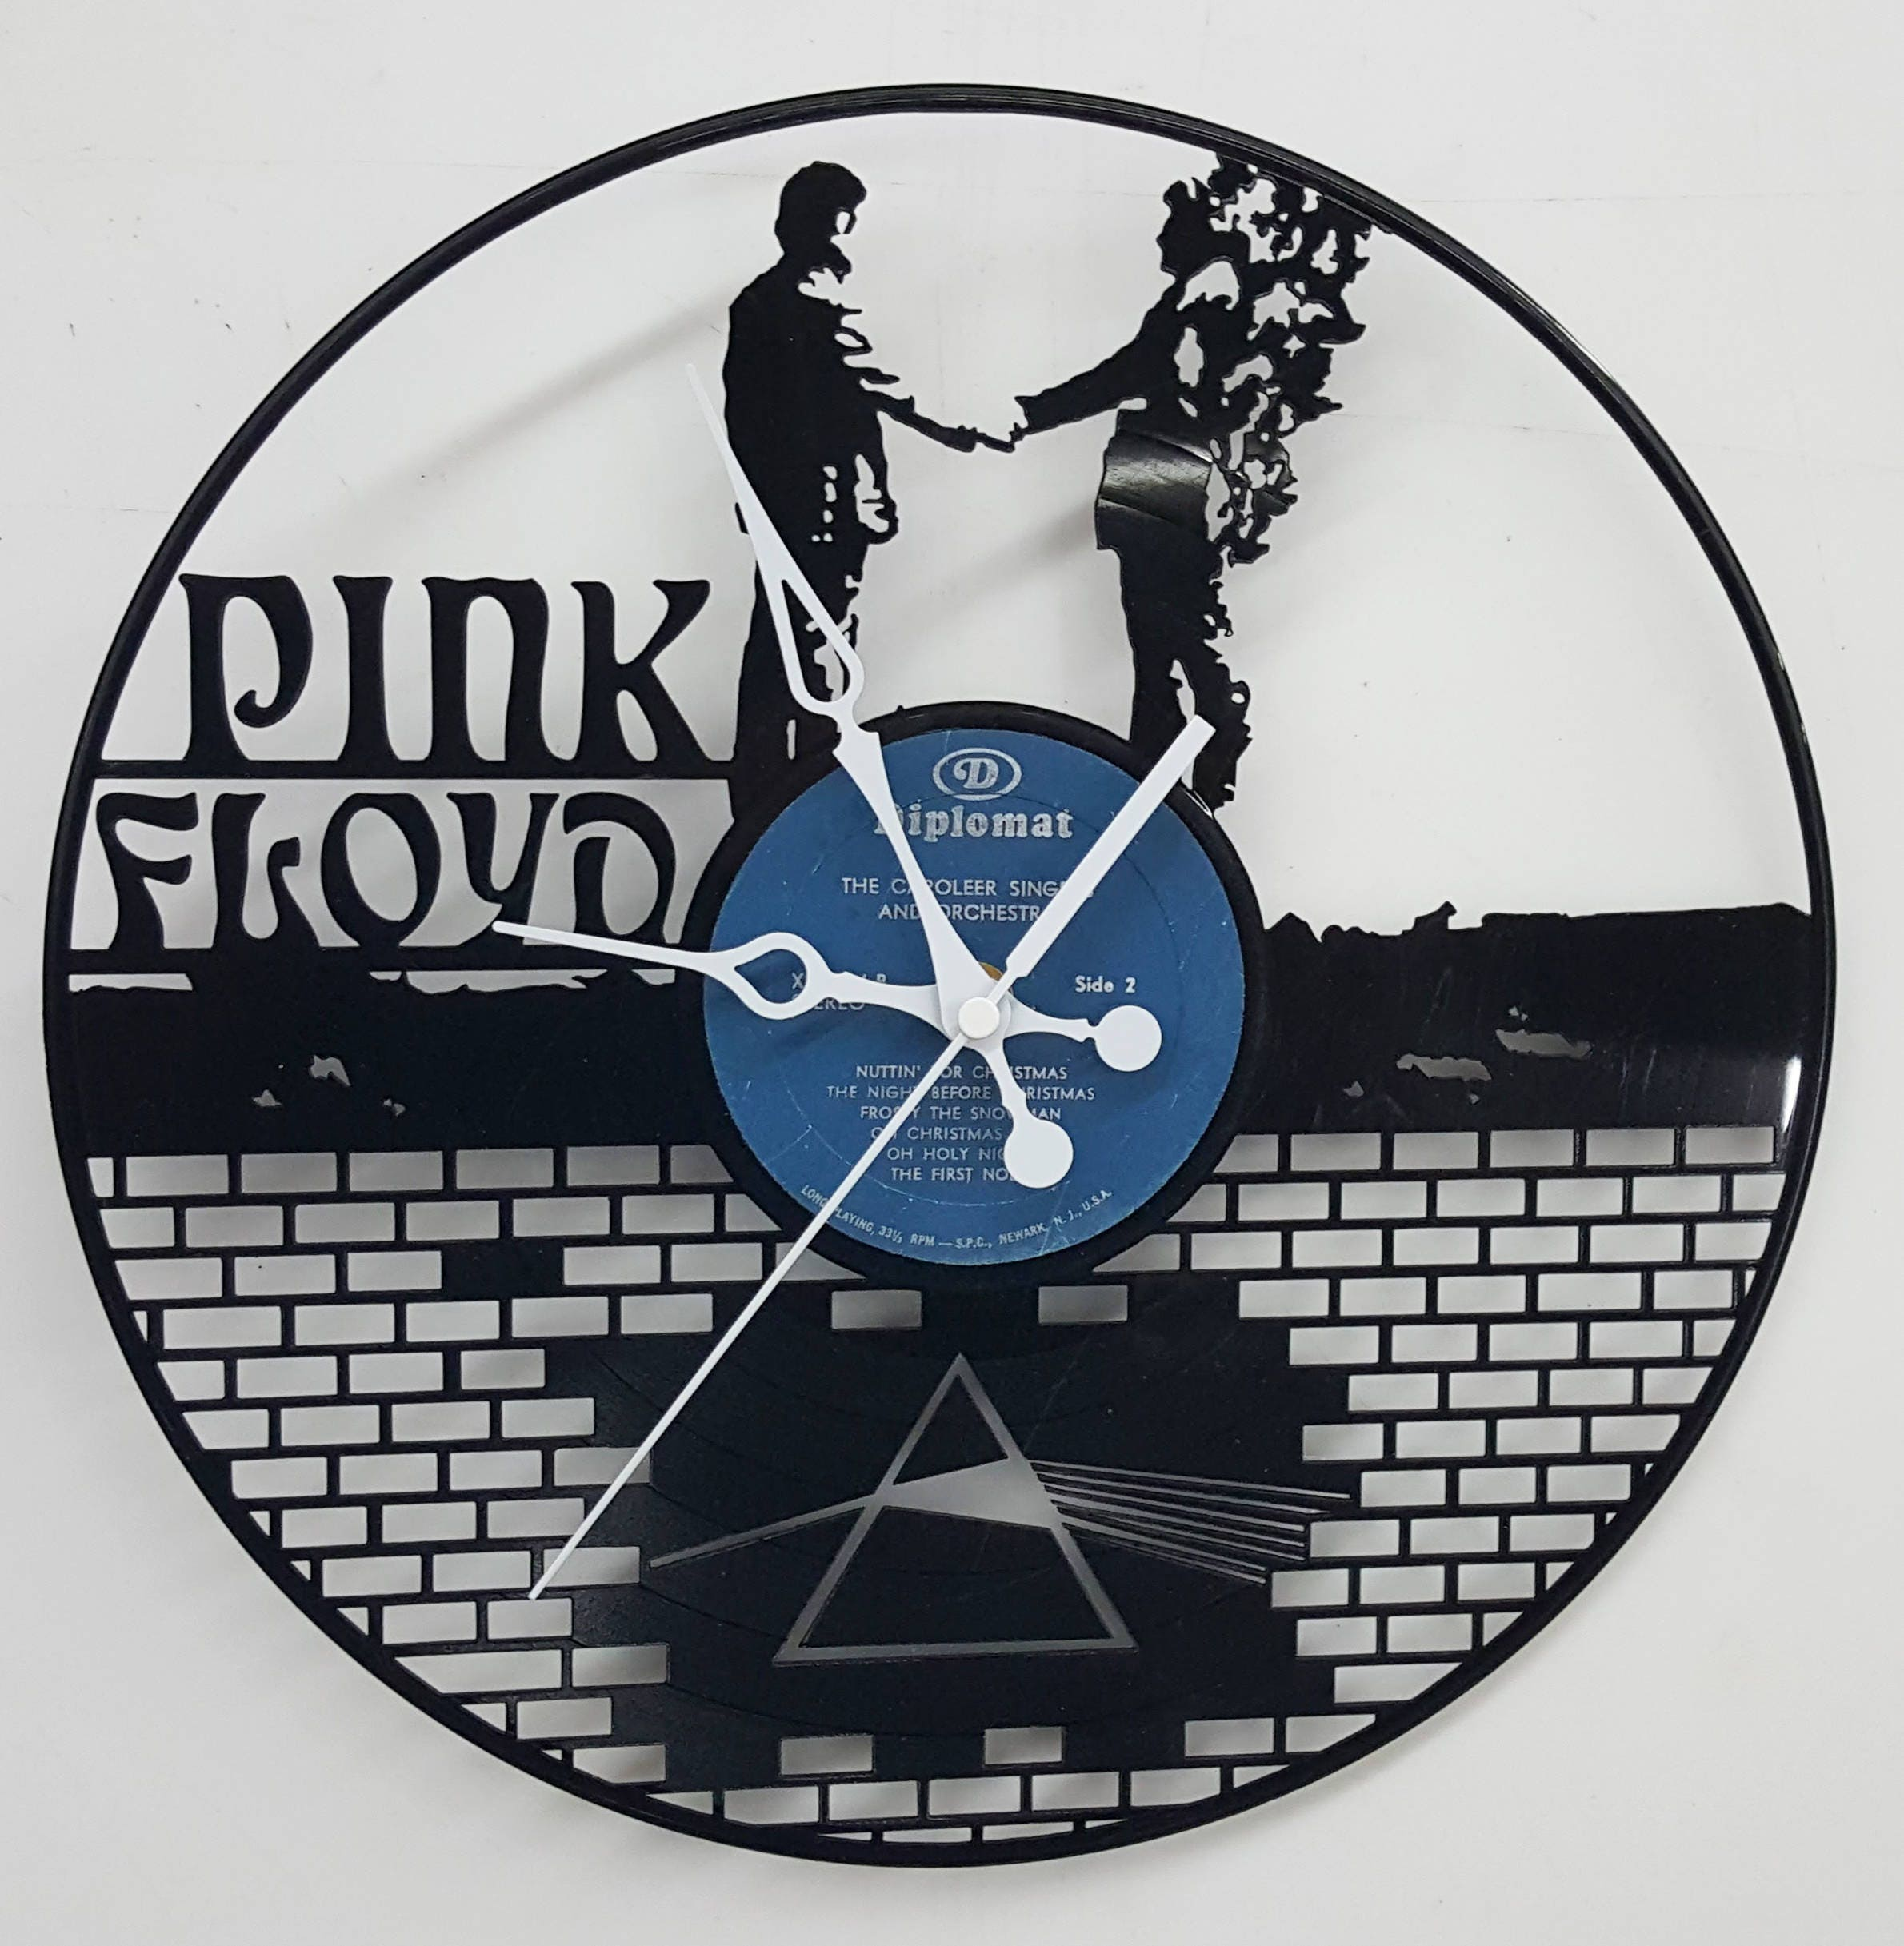 Pink Floyd Wall Art pink floyd vinyl record clock, pink floyd the wall clock, custom